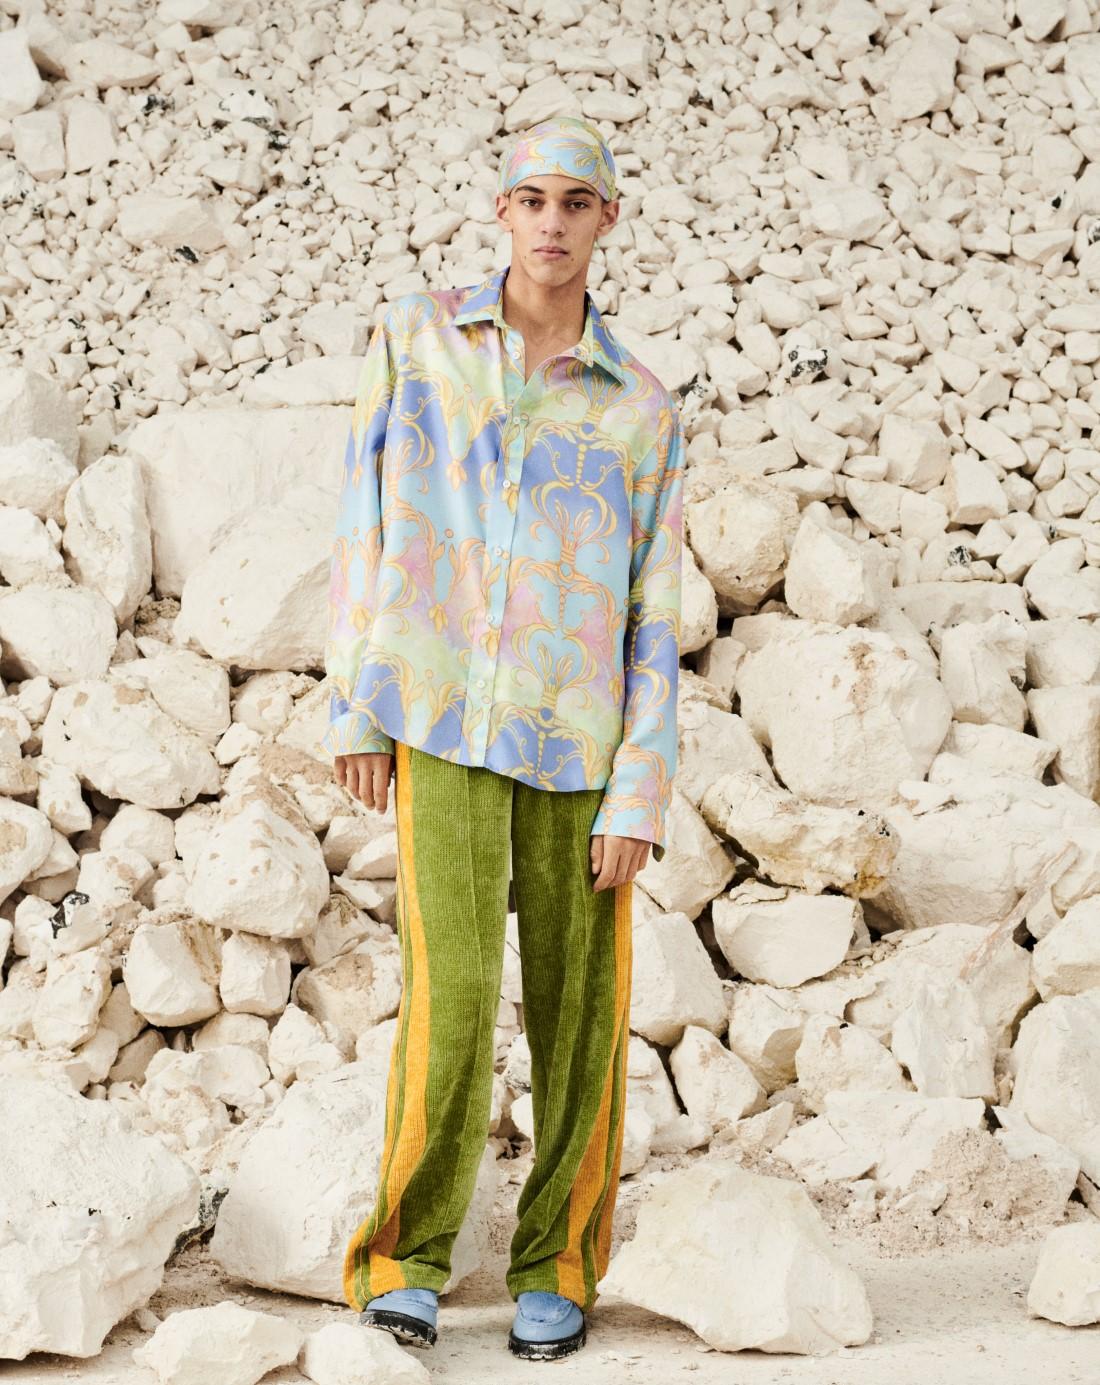 Bluemarble - Automne-Hiver 2021 - Paris Fashion Week